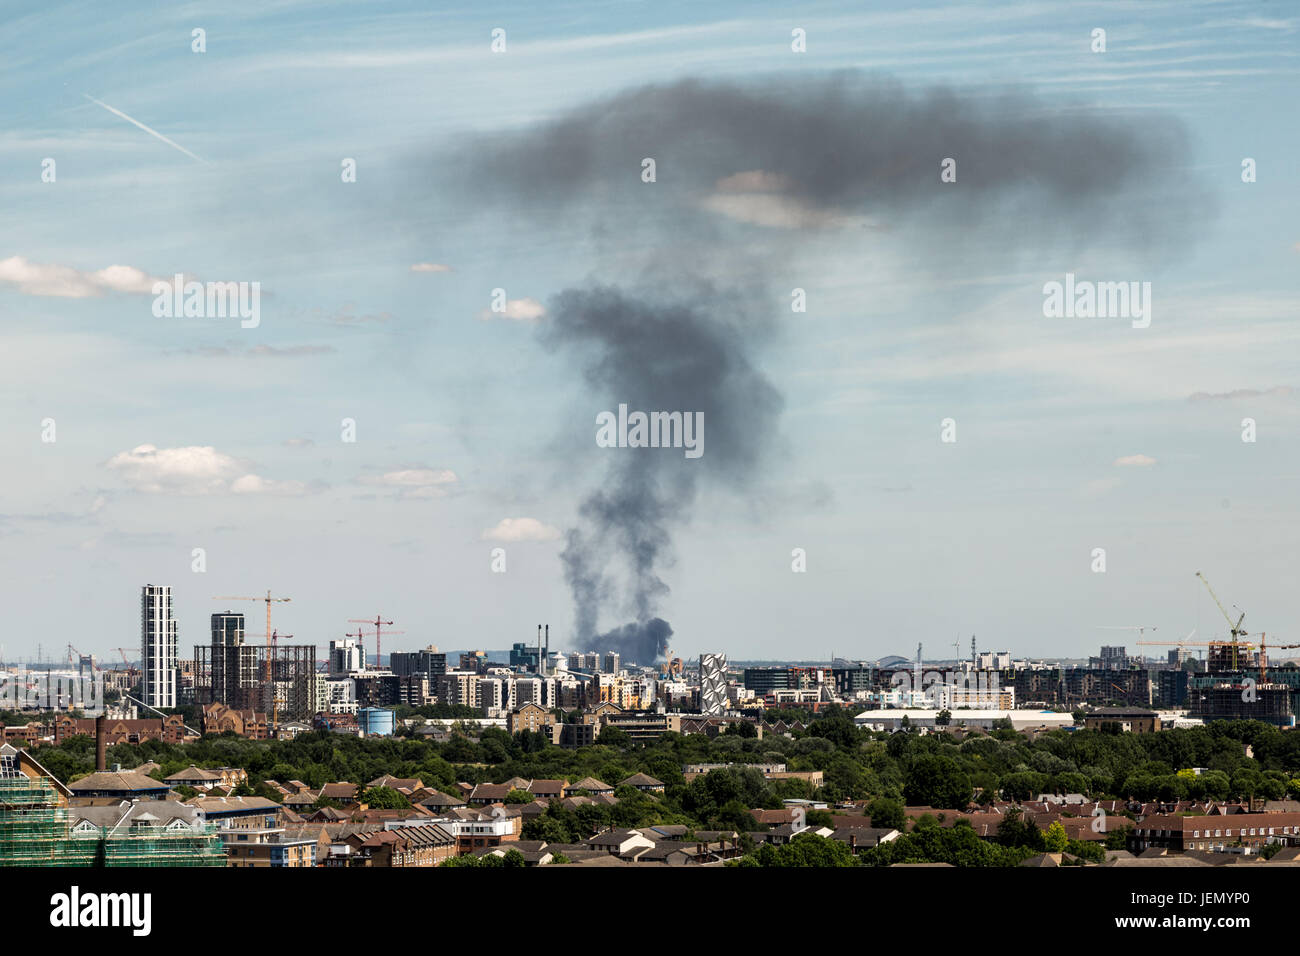 London, UK. 26th June, 2017. Black smoke rises from a large fire in a car storage yard on Ferry Lane, Rainham, East Stock Photo